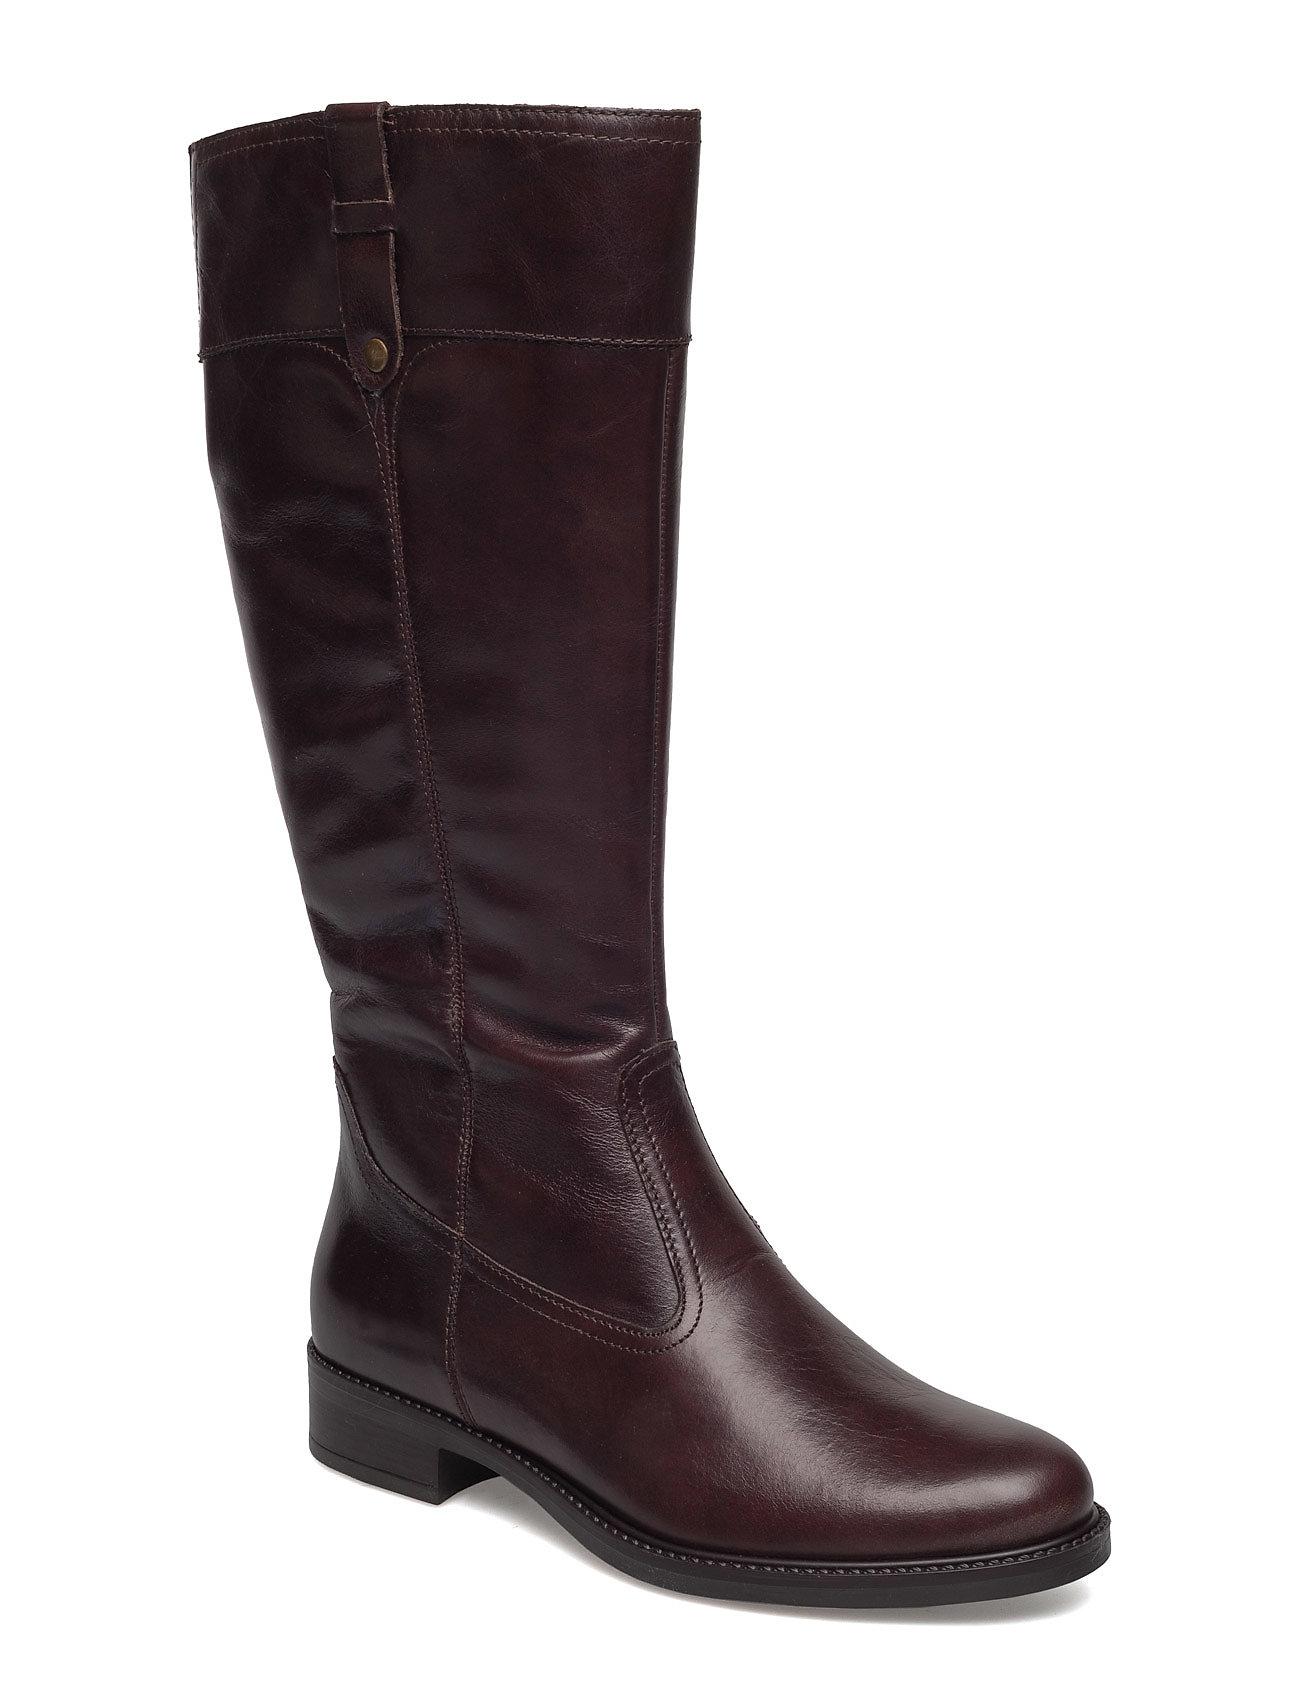 tamaris – Woms boots - jessy på boozt.com dk